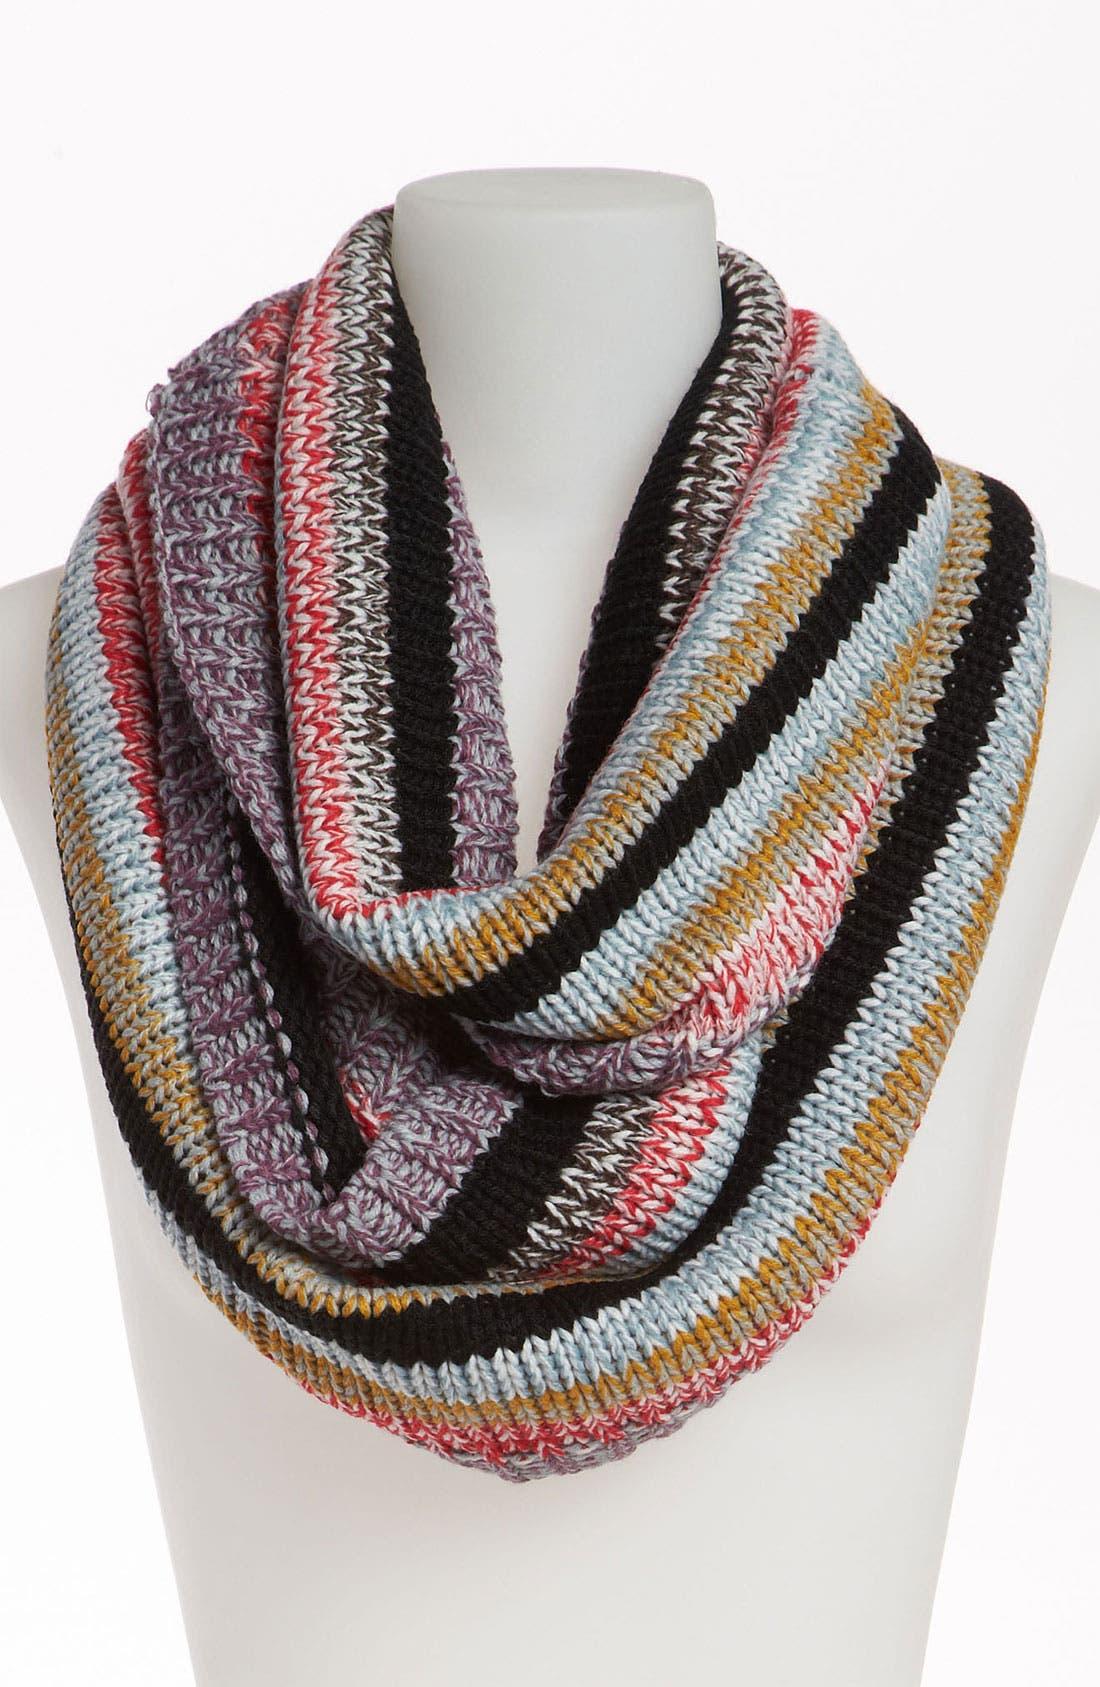 Alternate Image 1 Selected - BP. Stripe Knit Infinity Scarf